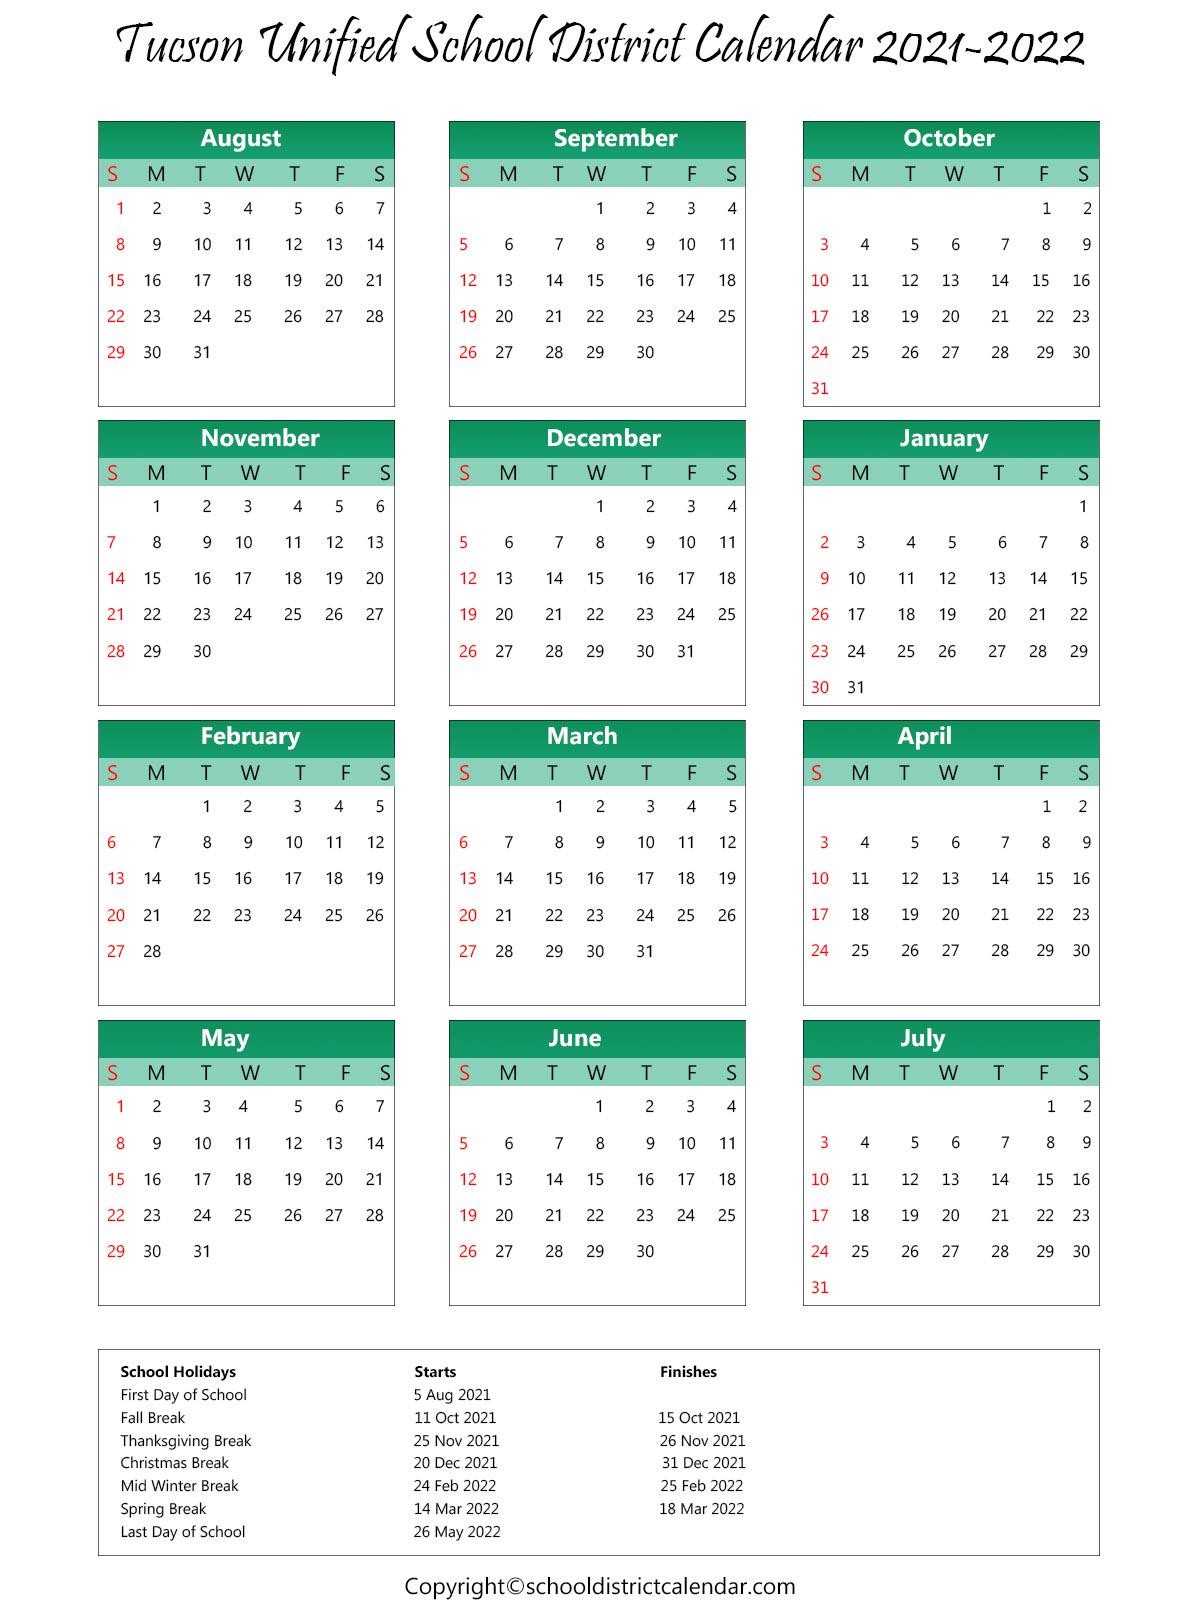 Tucson Unified School District, Arizona Calendar Holidays 2021